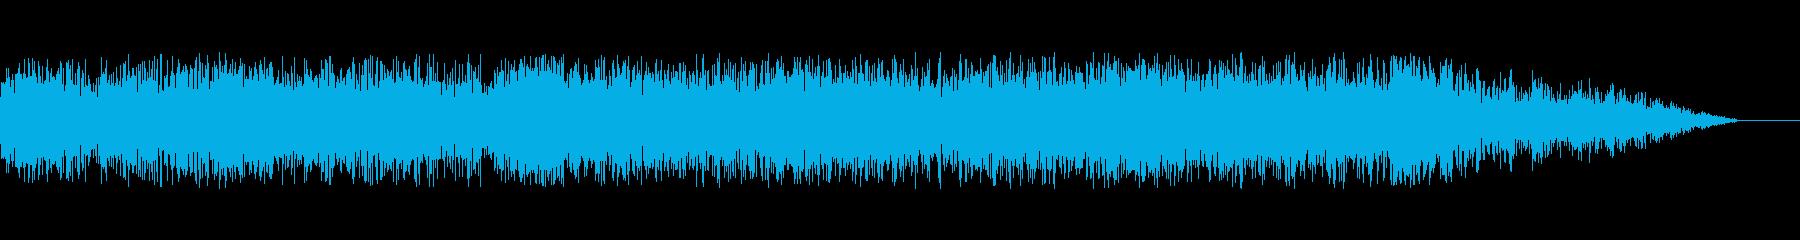 Orchestral-Film-A...の再生済みの波形